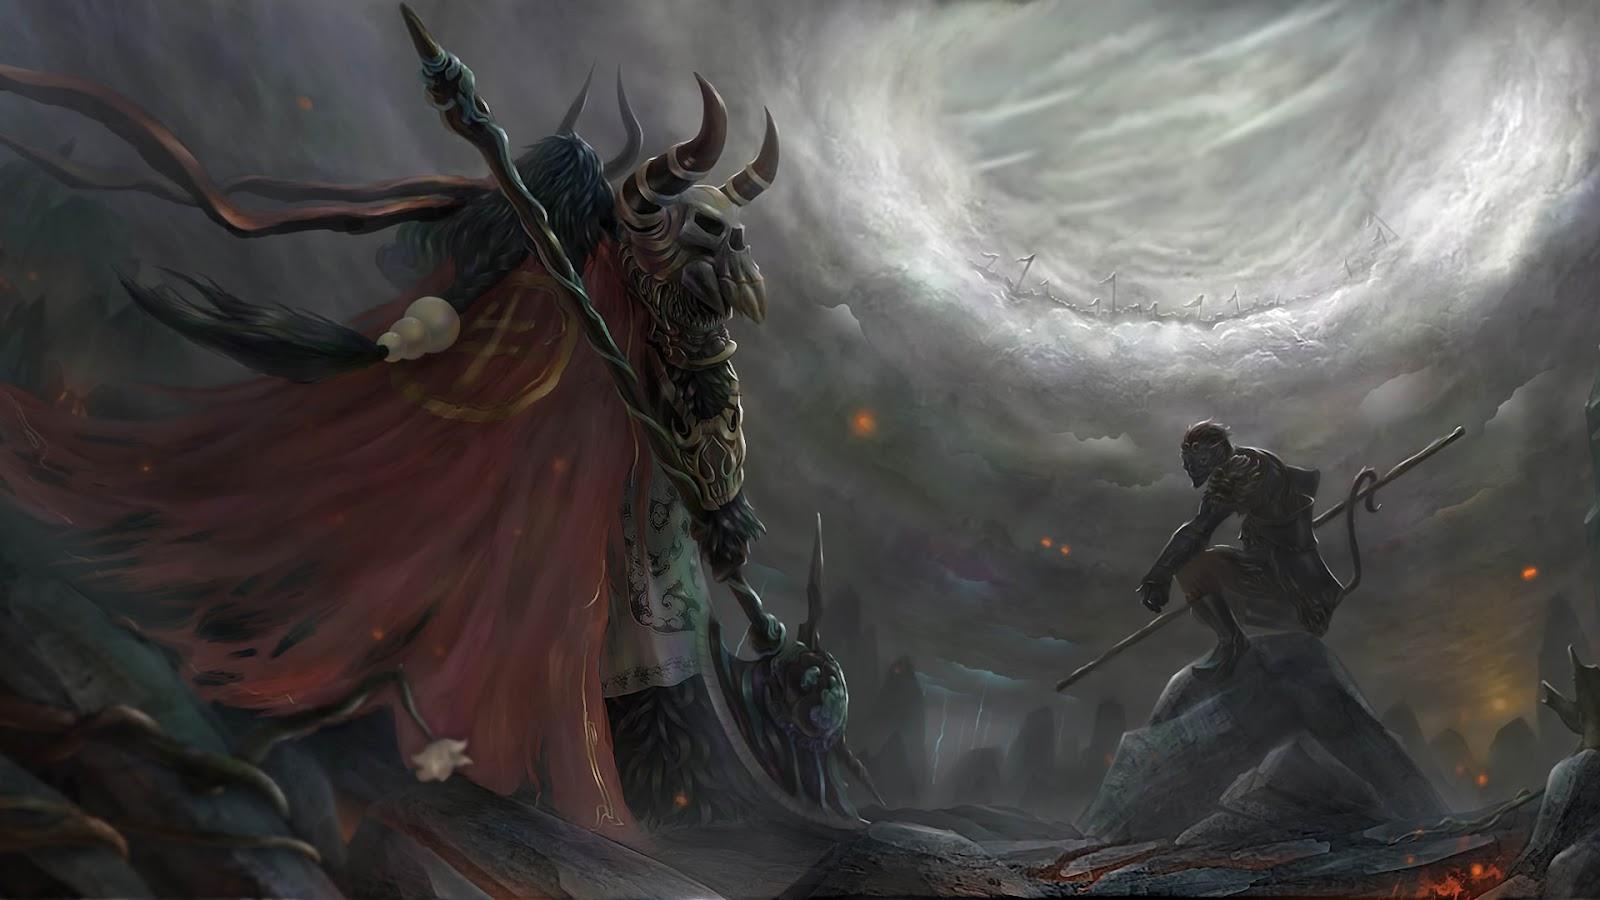 Guerrero vs Demonio   Fondos de Pantalla HD   Wallpapers HD 1600x900